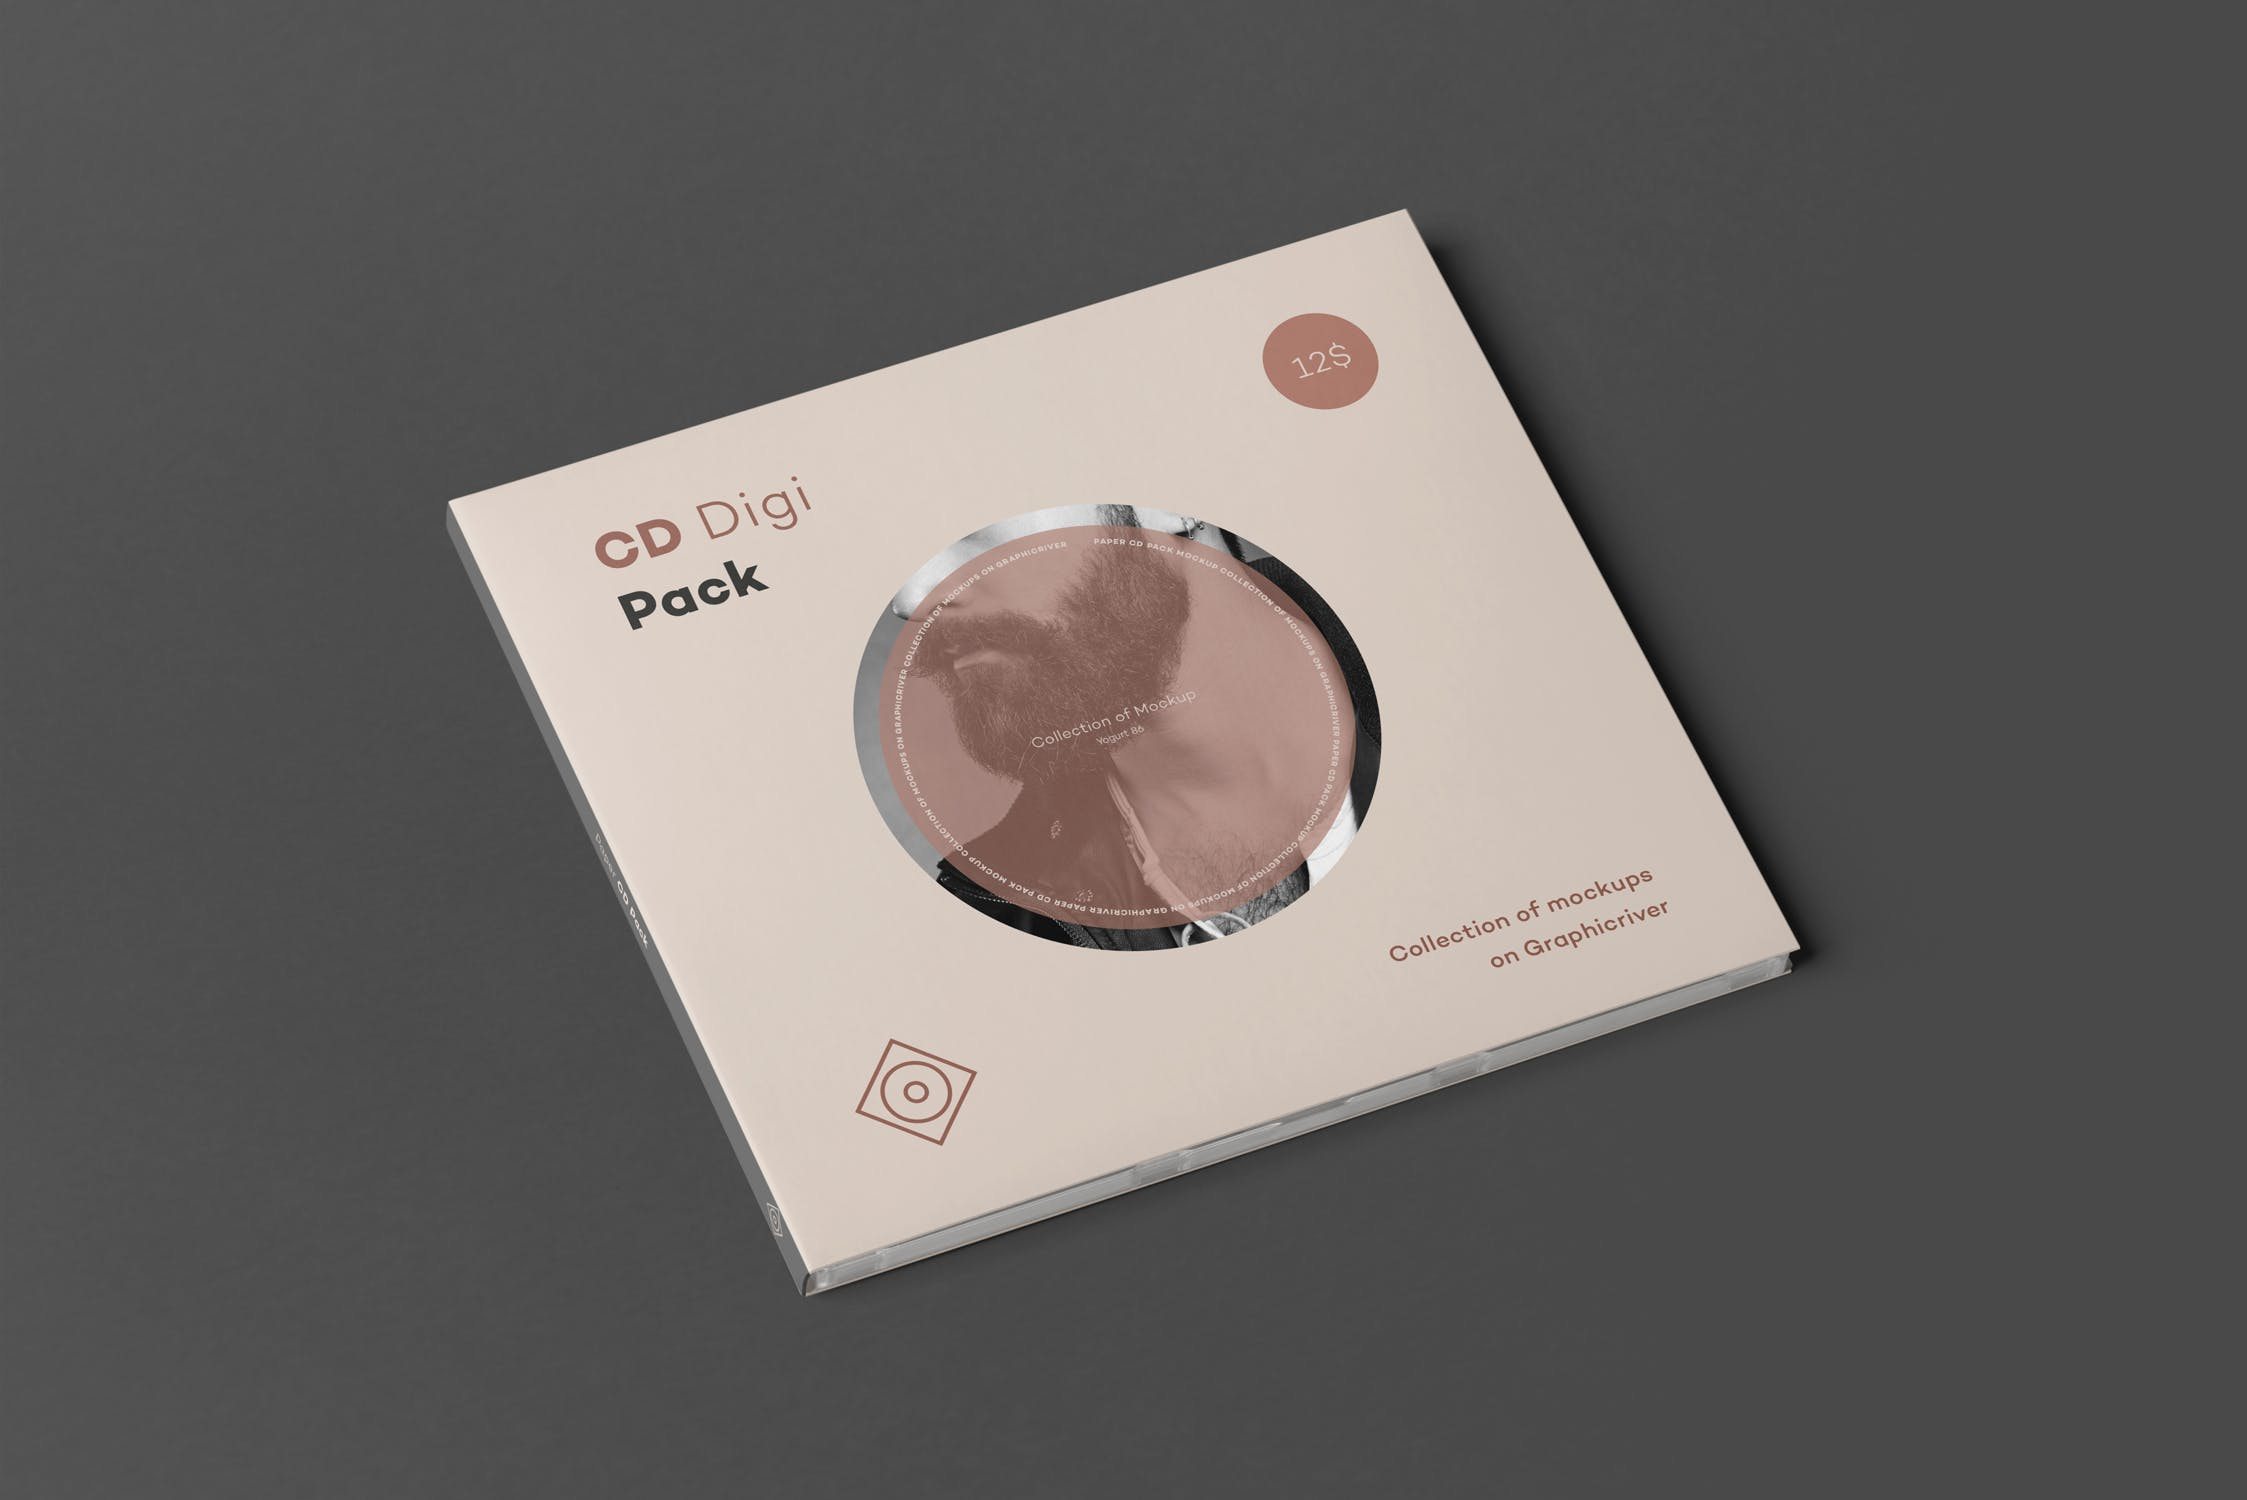 CD唱片样机包装素材多角度展示模板CD Digi Pack Mock-up 2